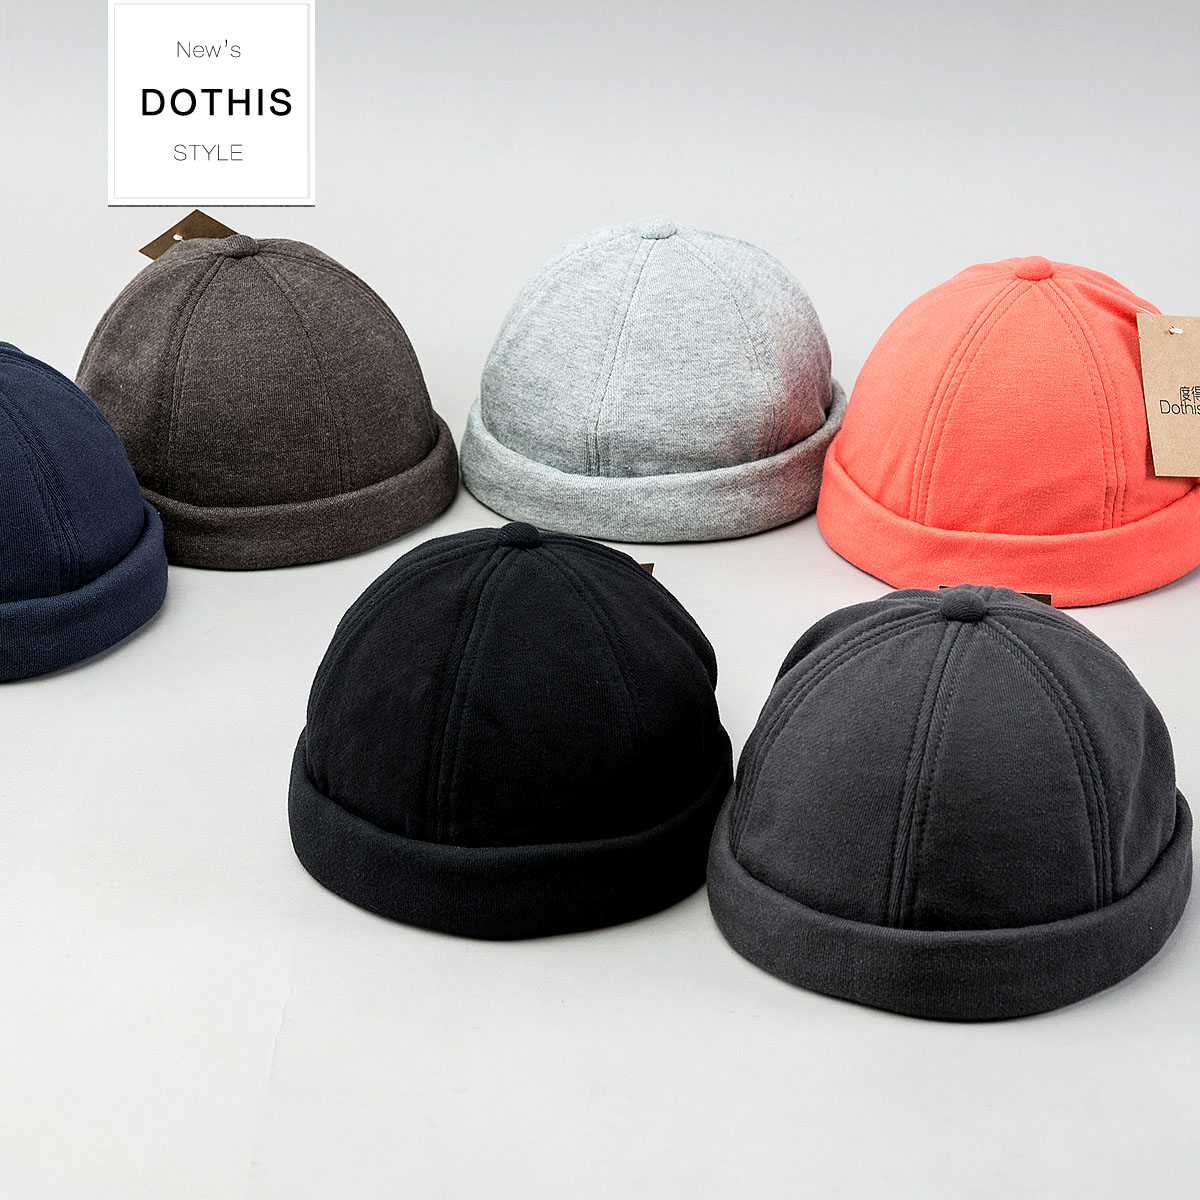 Amazoncom mens winter dress hats